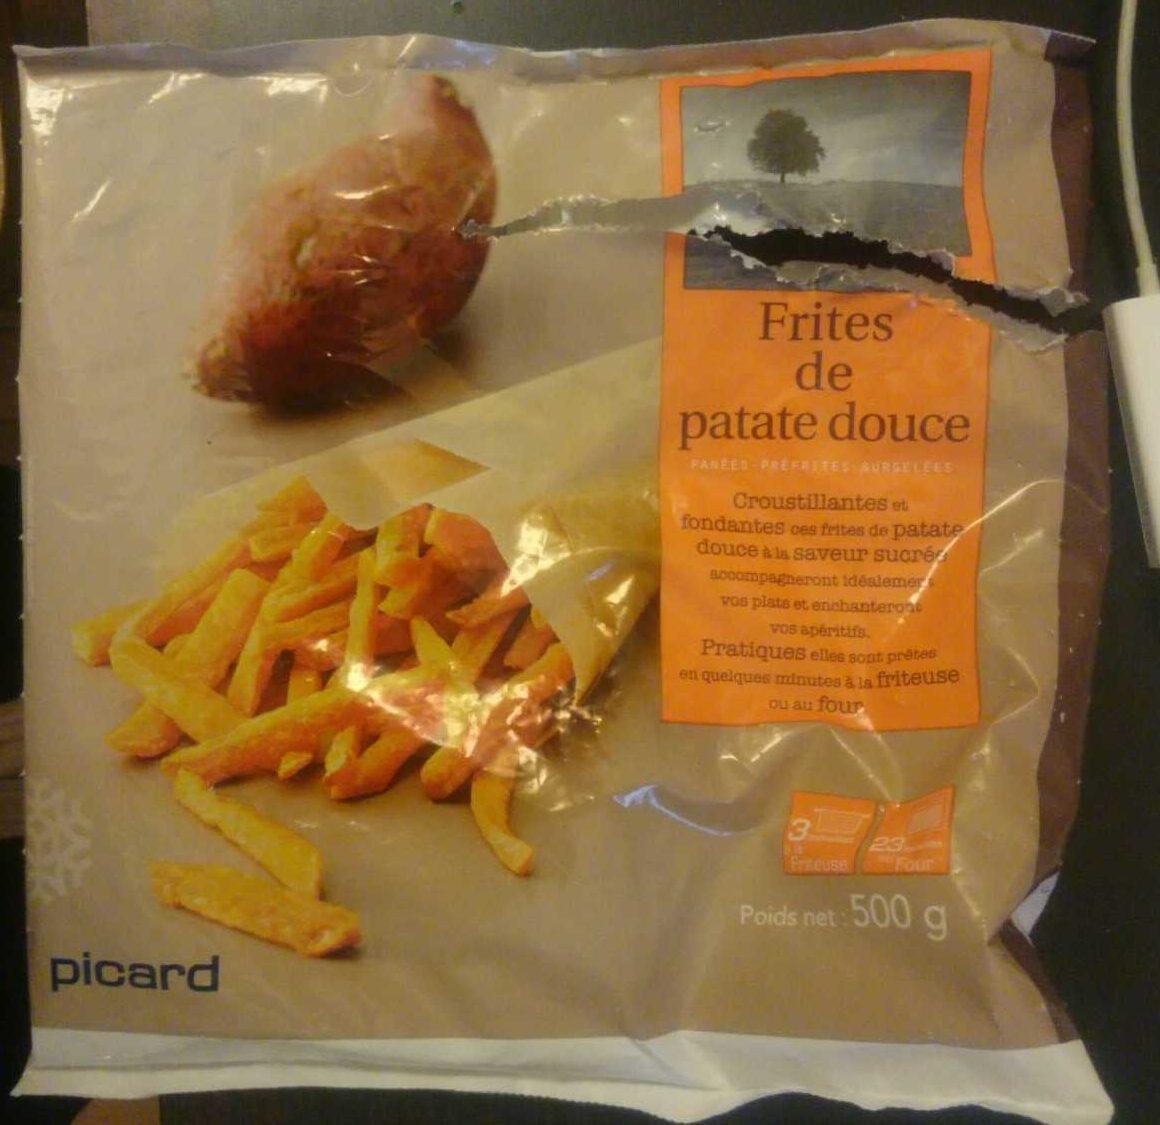 Frites de patate douce - Product